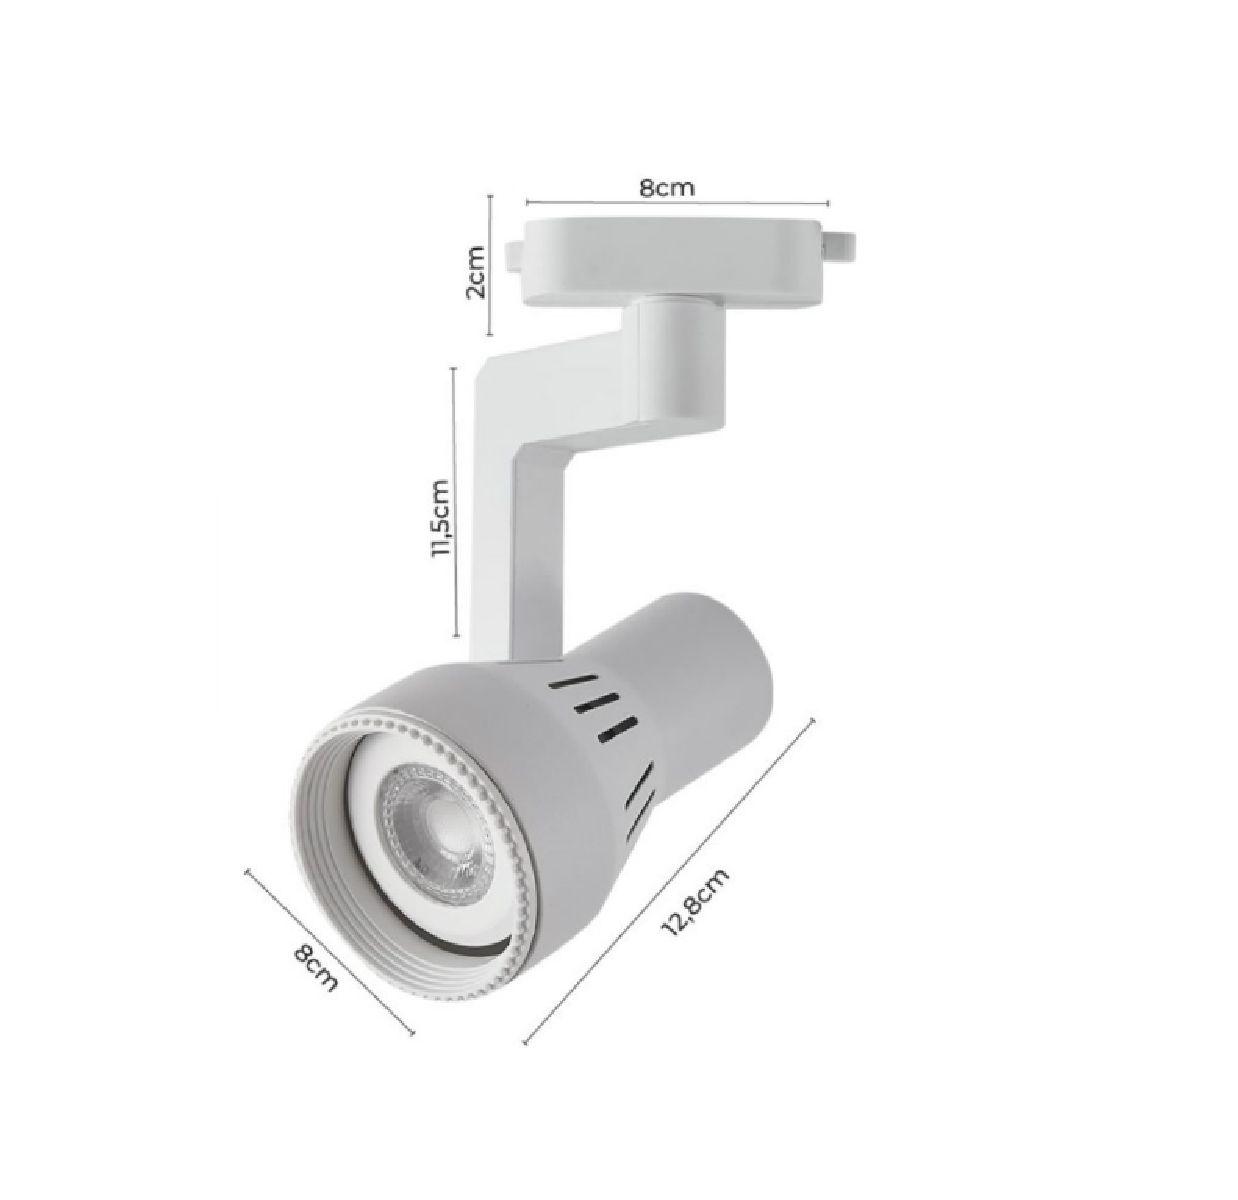 Kit Trilho Eletrificado 1,5m Branco Oko Nordecor + 4 Spot Par20